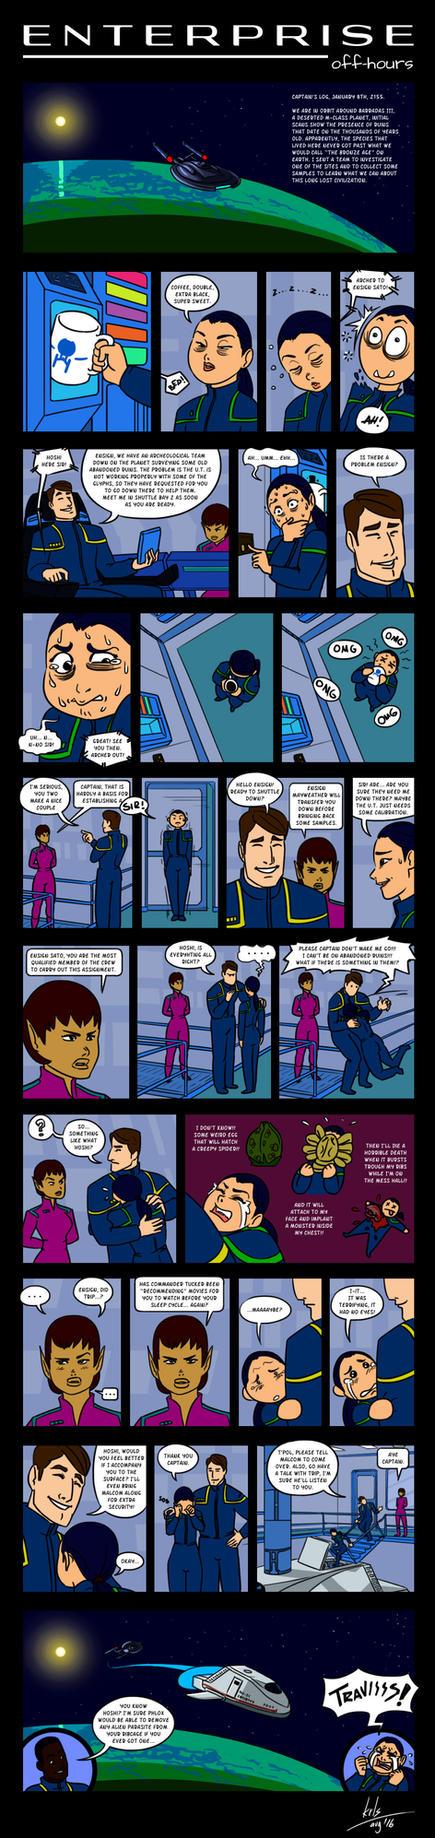 Enterprise Off Hours by krls81